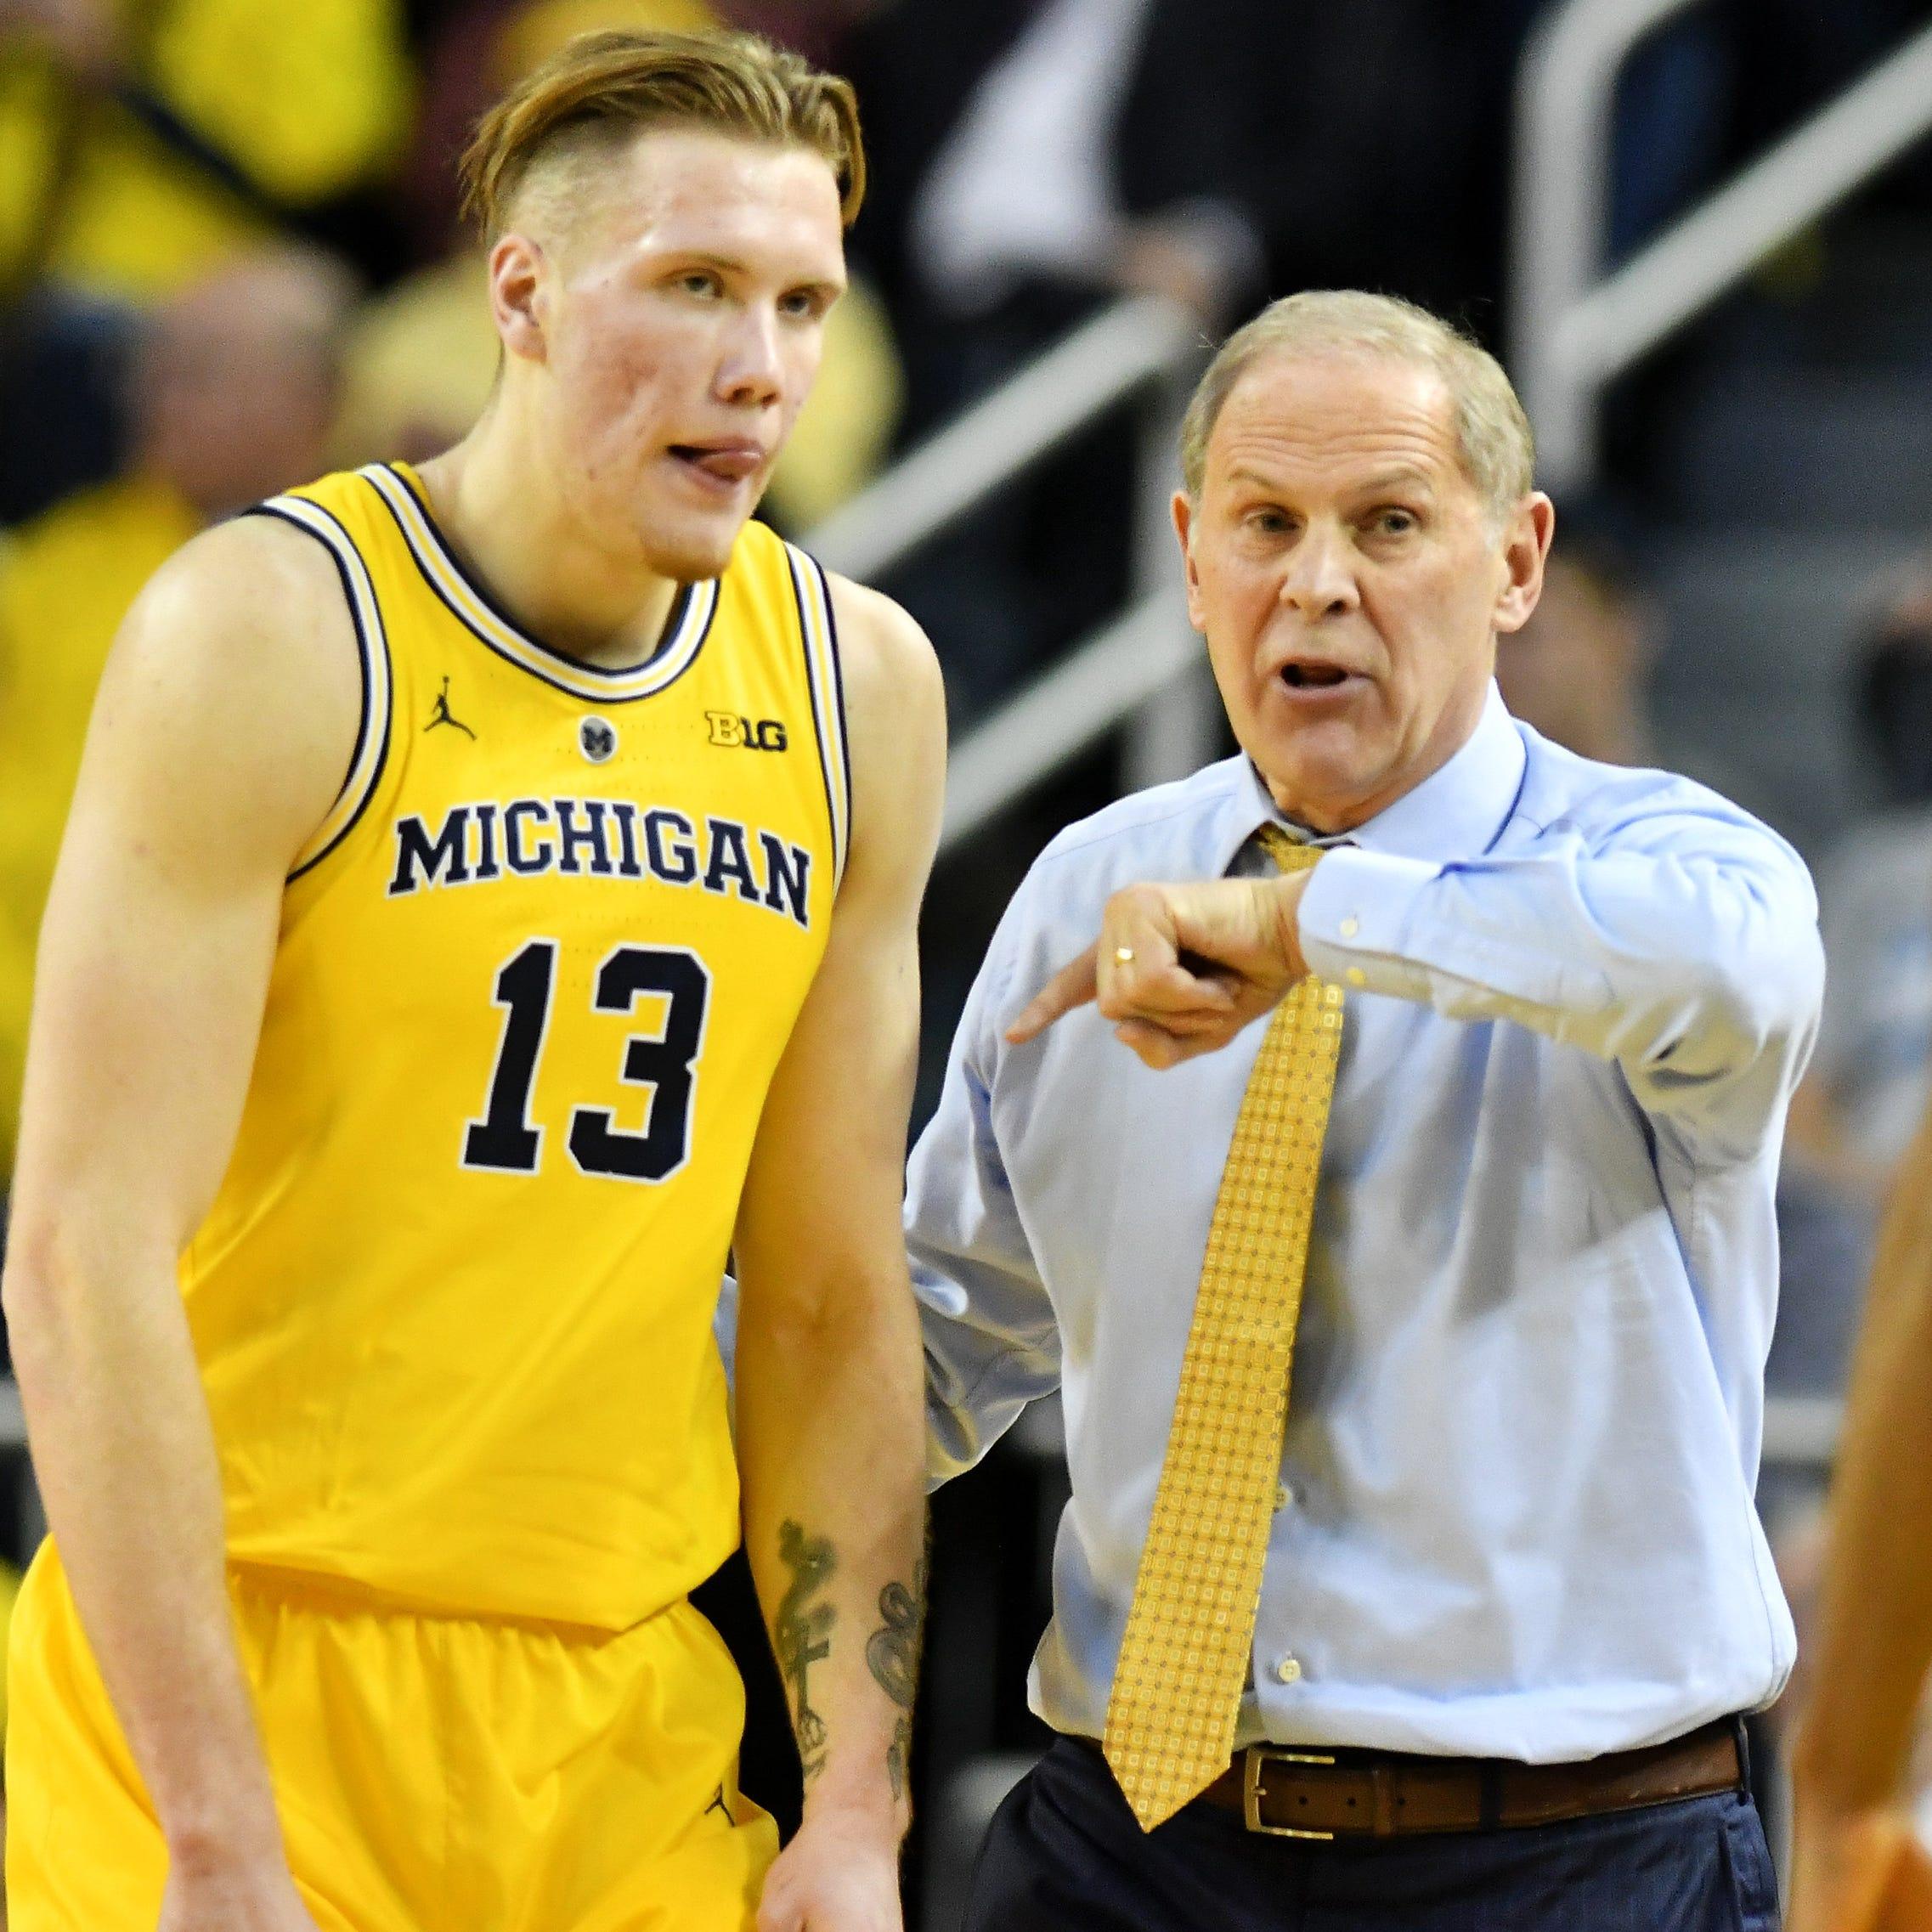 Niyo: As John Beilein heads to NBA, pressure shifts to Michigan's Warde Manuel